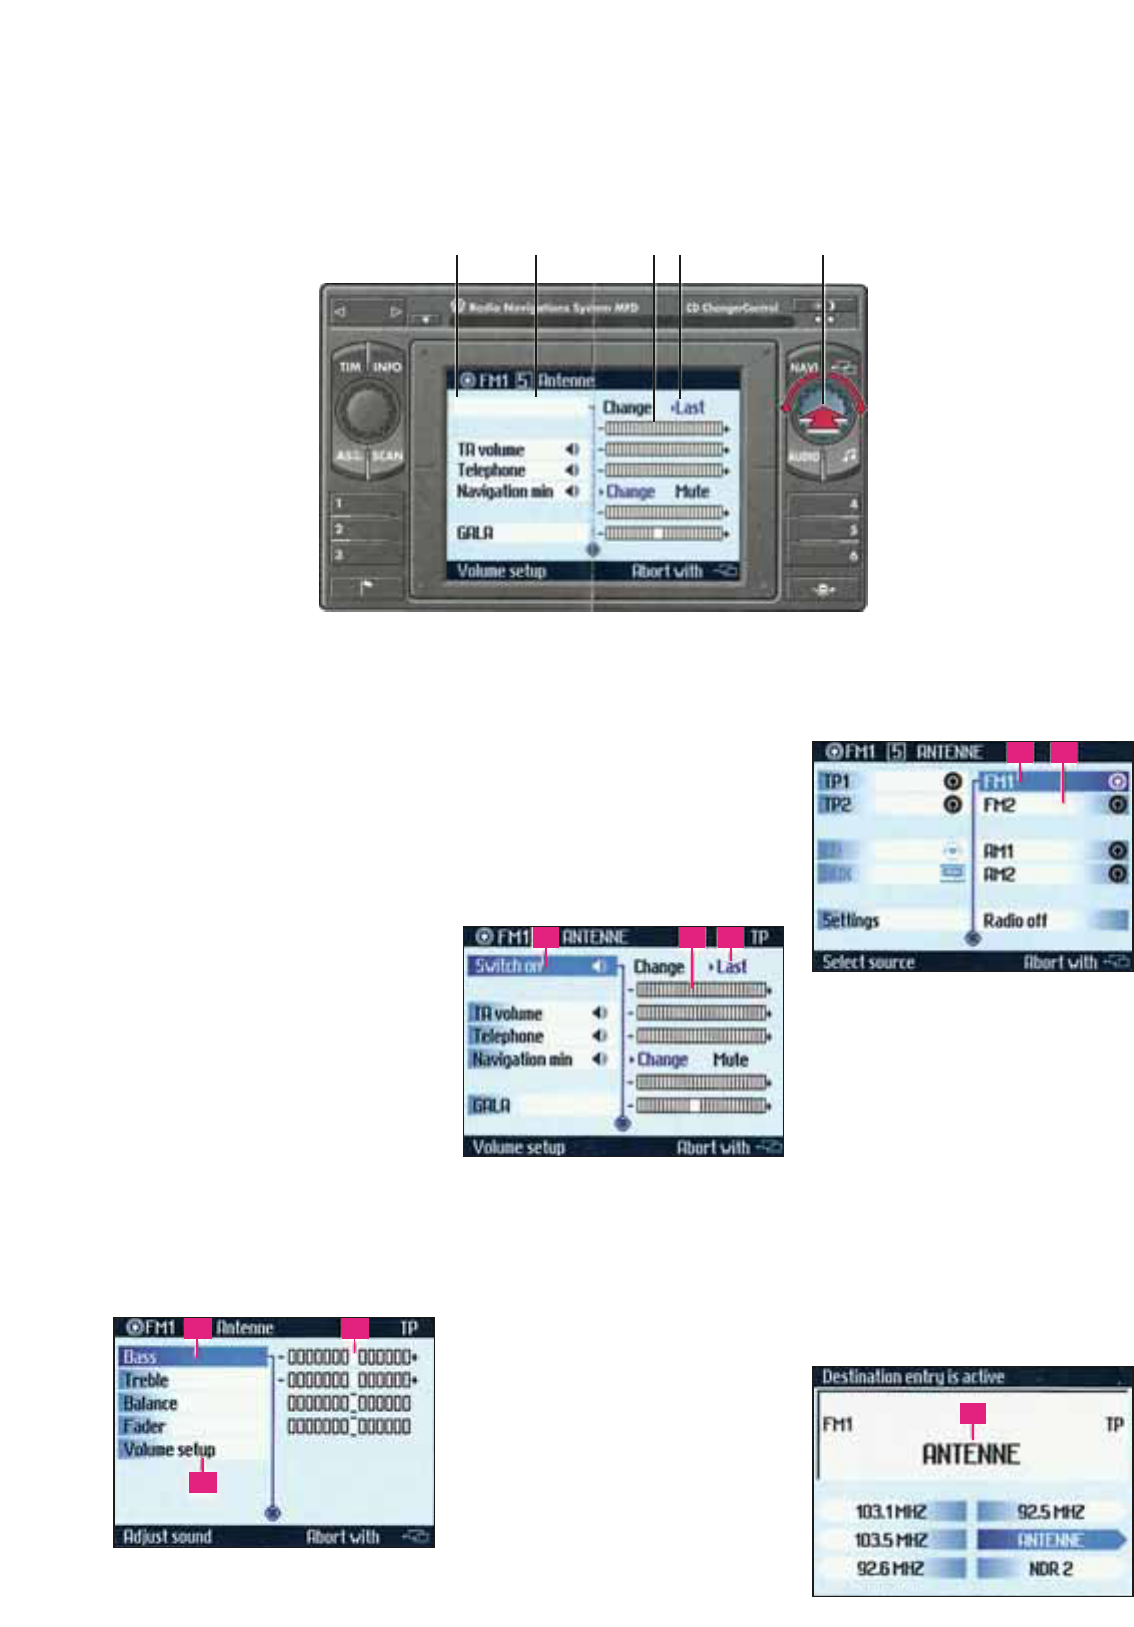 Manual Volkswagen Mfd Radio Navigation System Page 1 Of 4 English